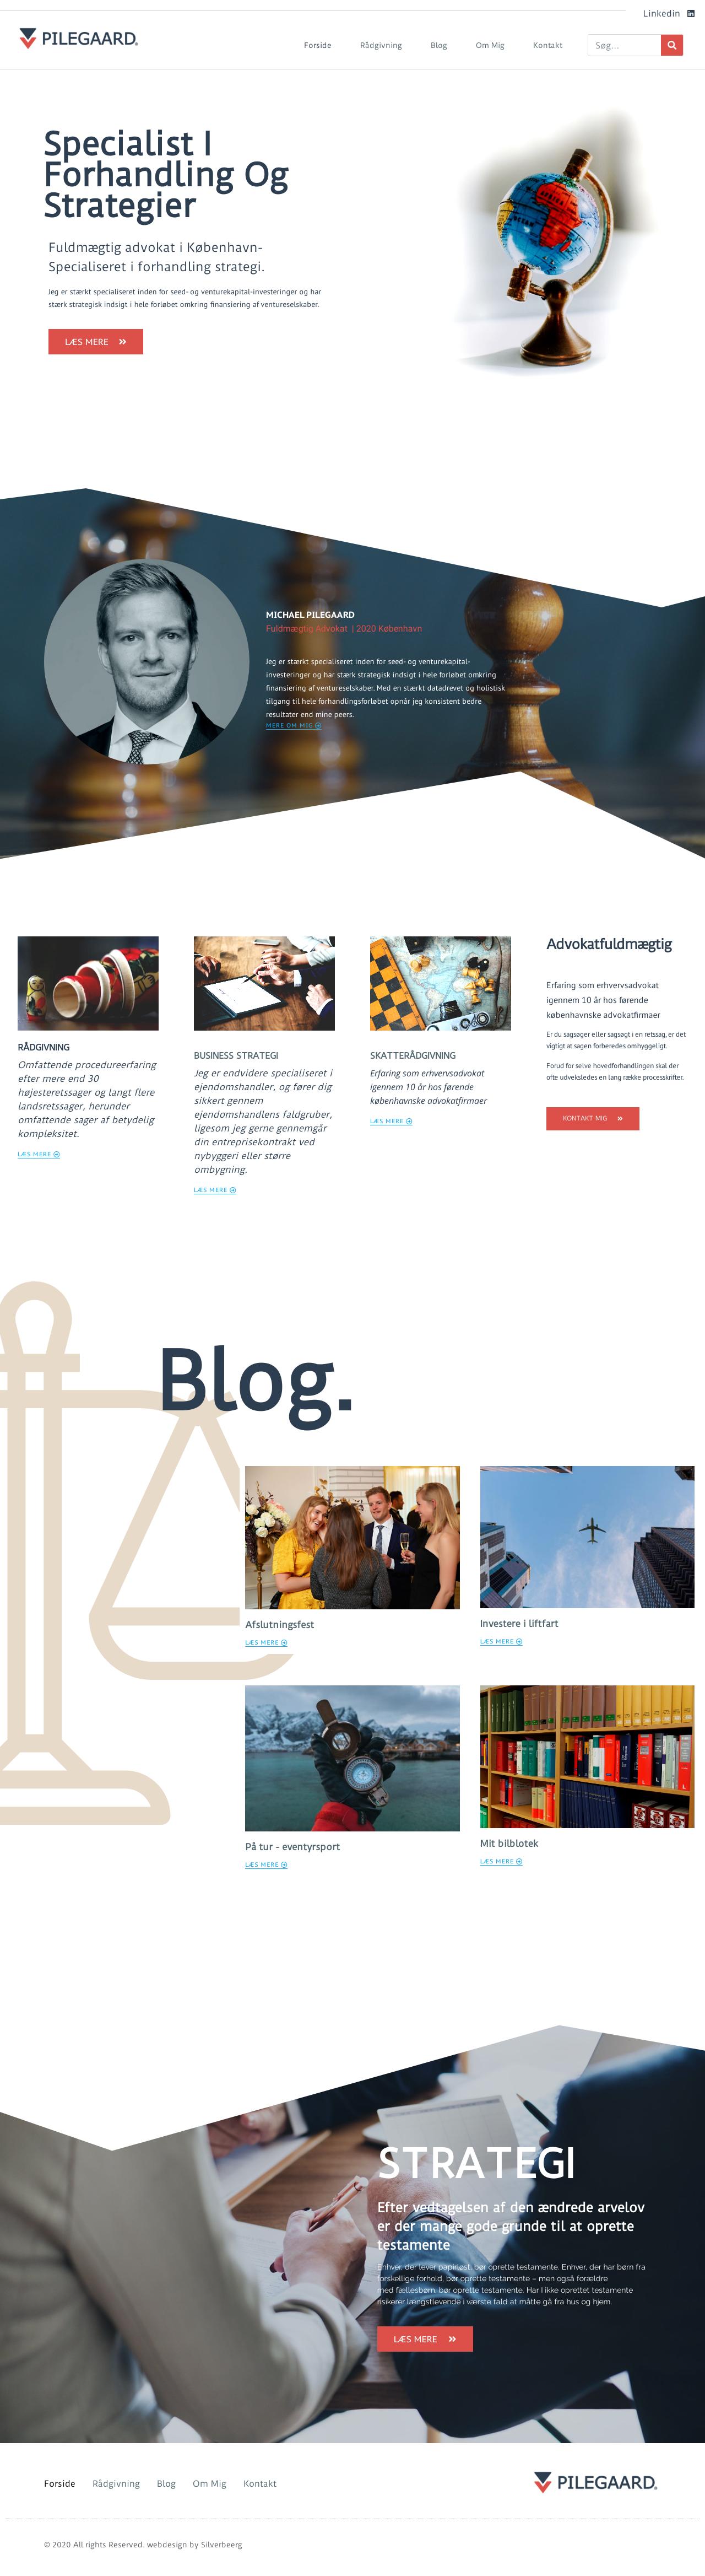 Ny hjemmeside advokat & jurist inkl. SEO